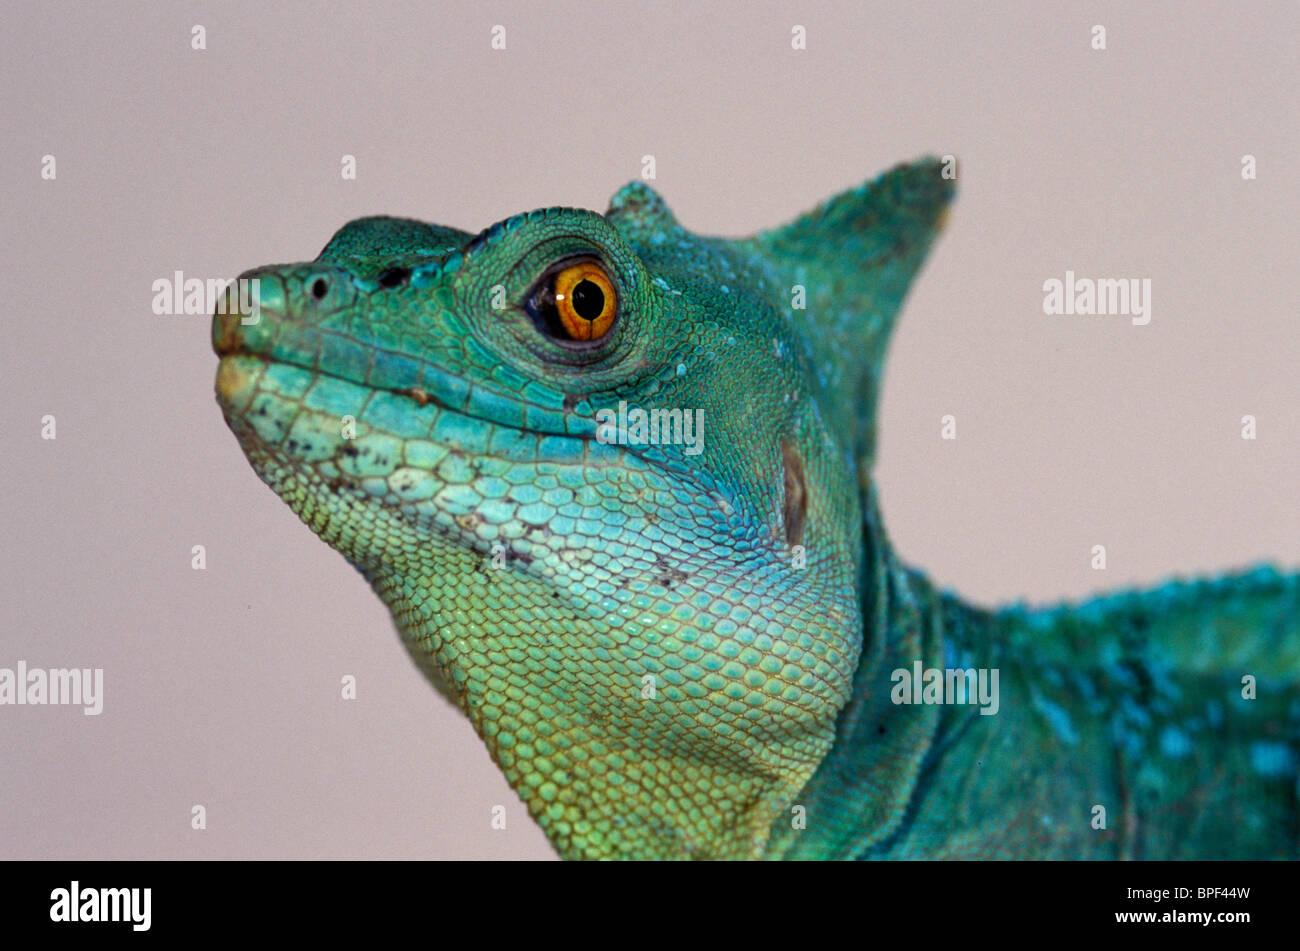 Green Basilisk (Basillicus plumifrons) - Stock Image